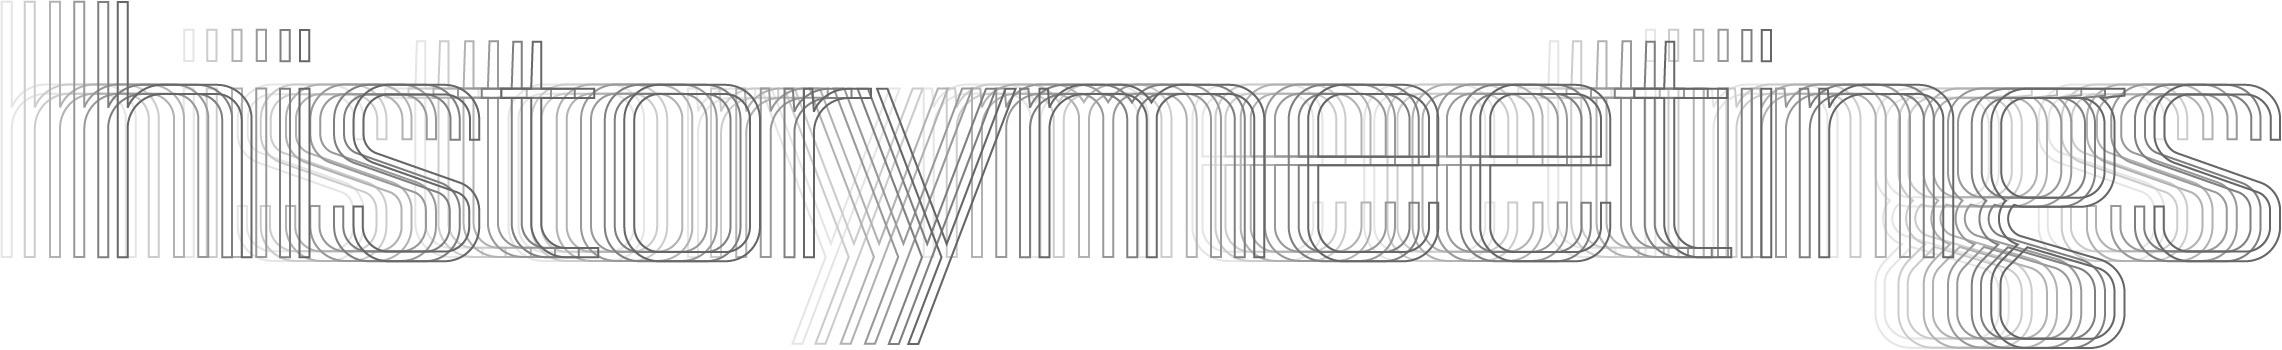 historymeetings_logo